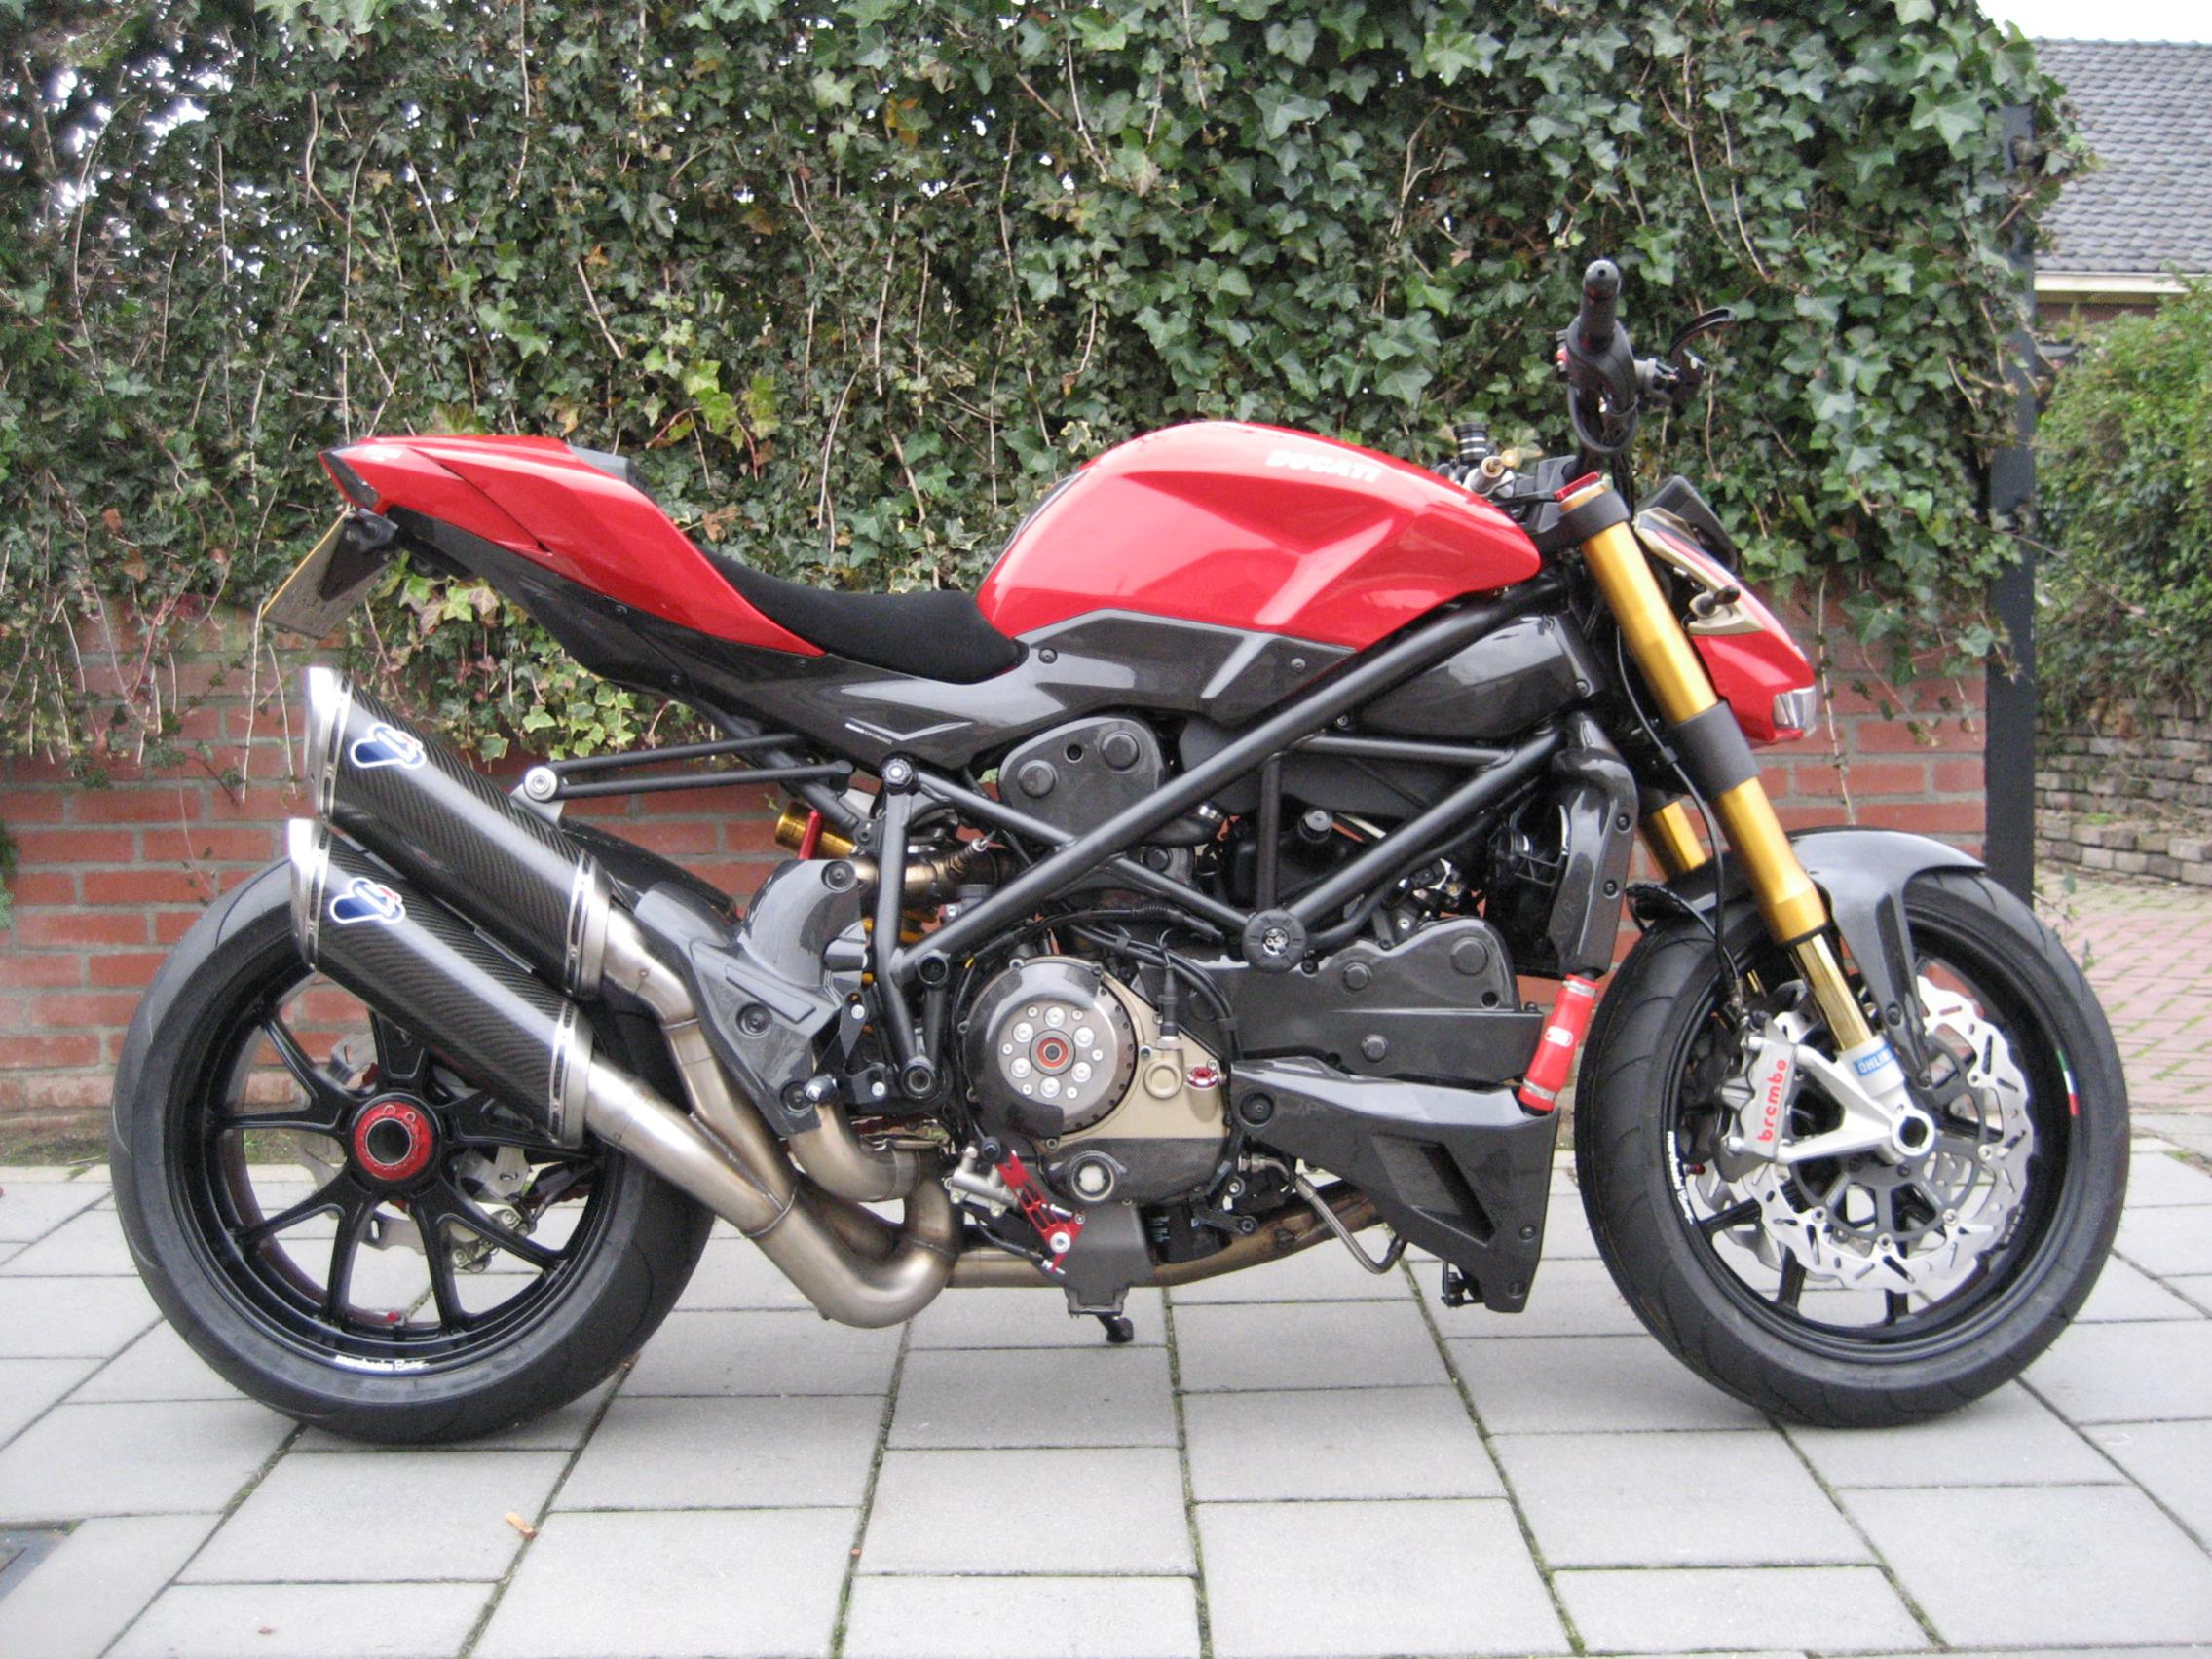 Ducati Monster 796 | Ducati monster 1100, Ducati monster